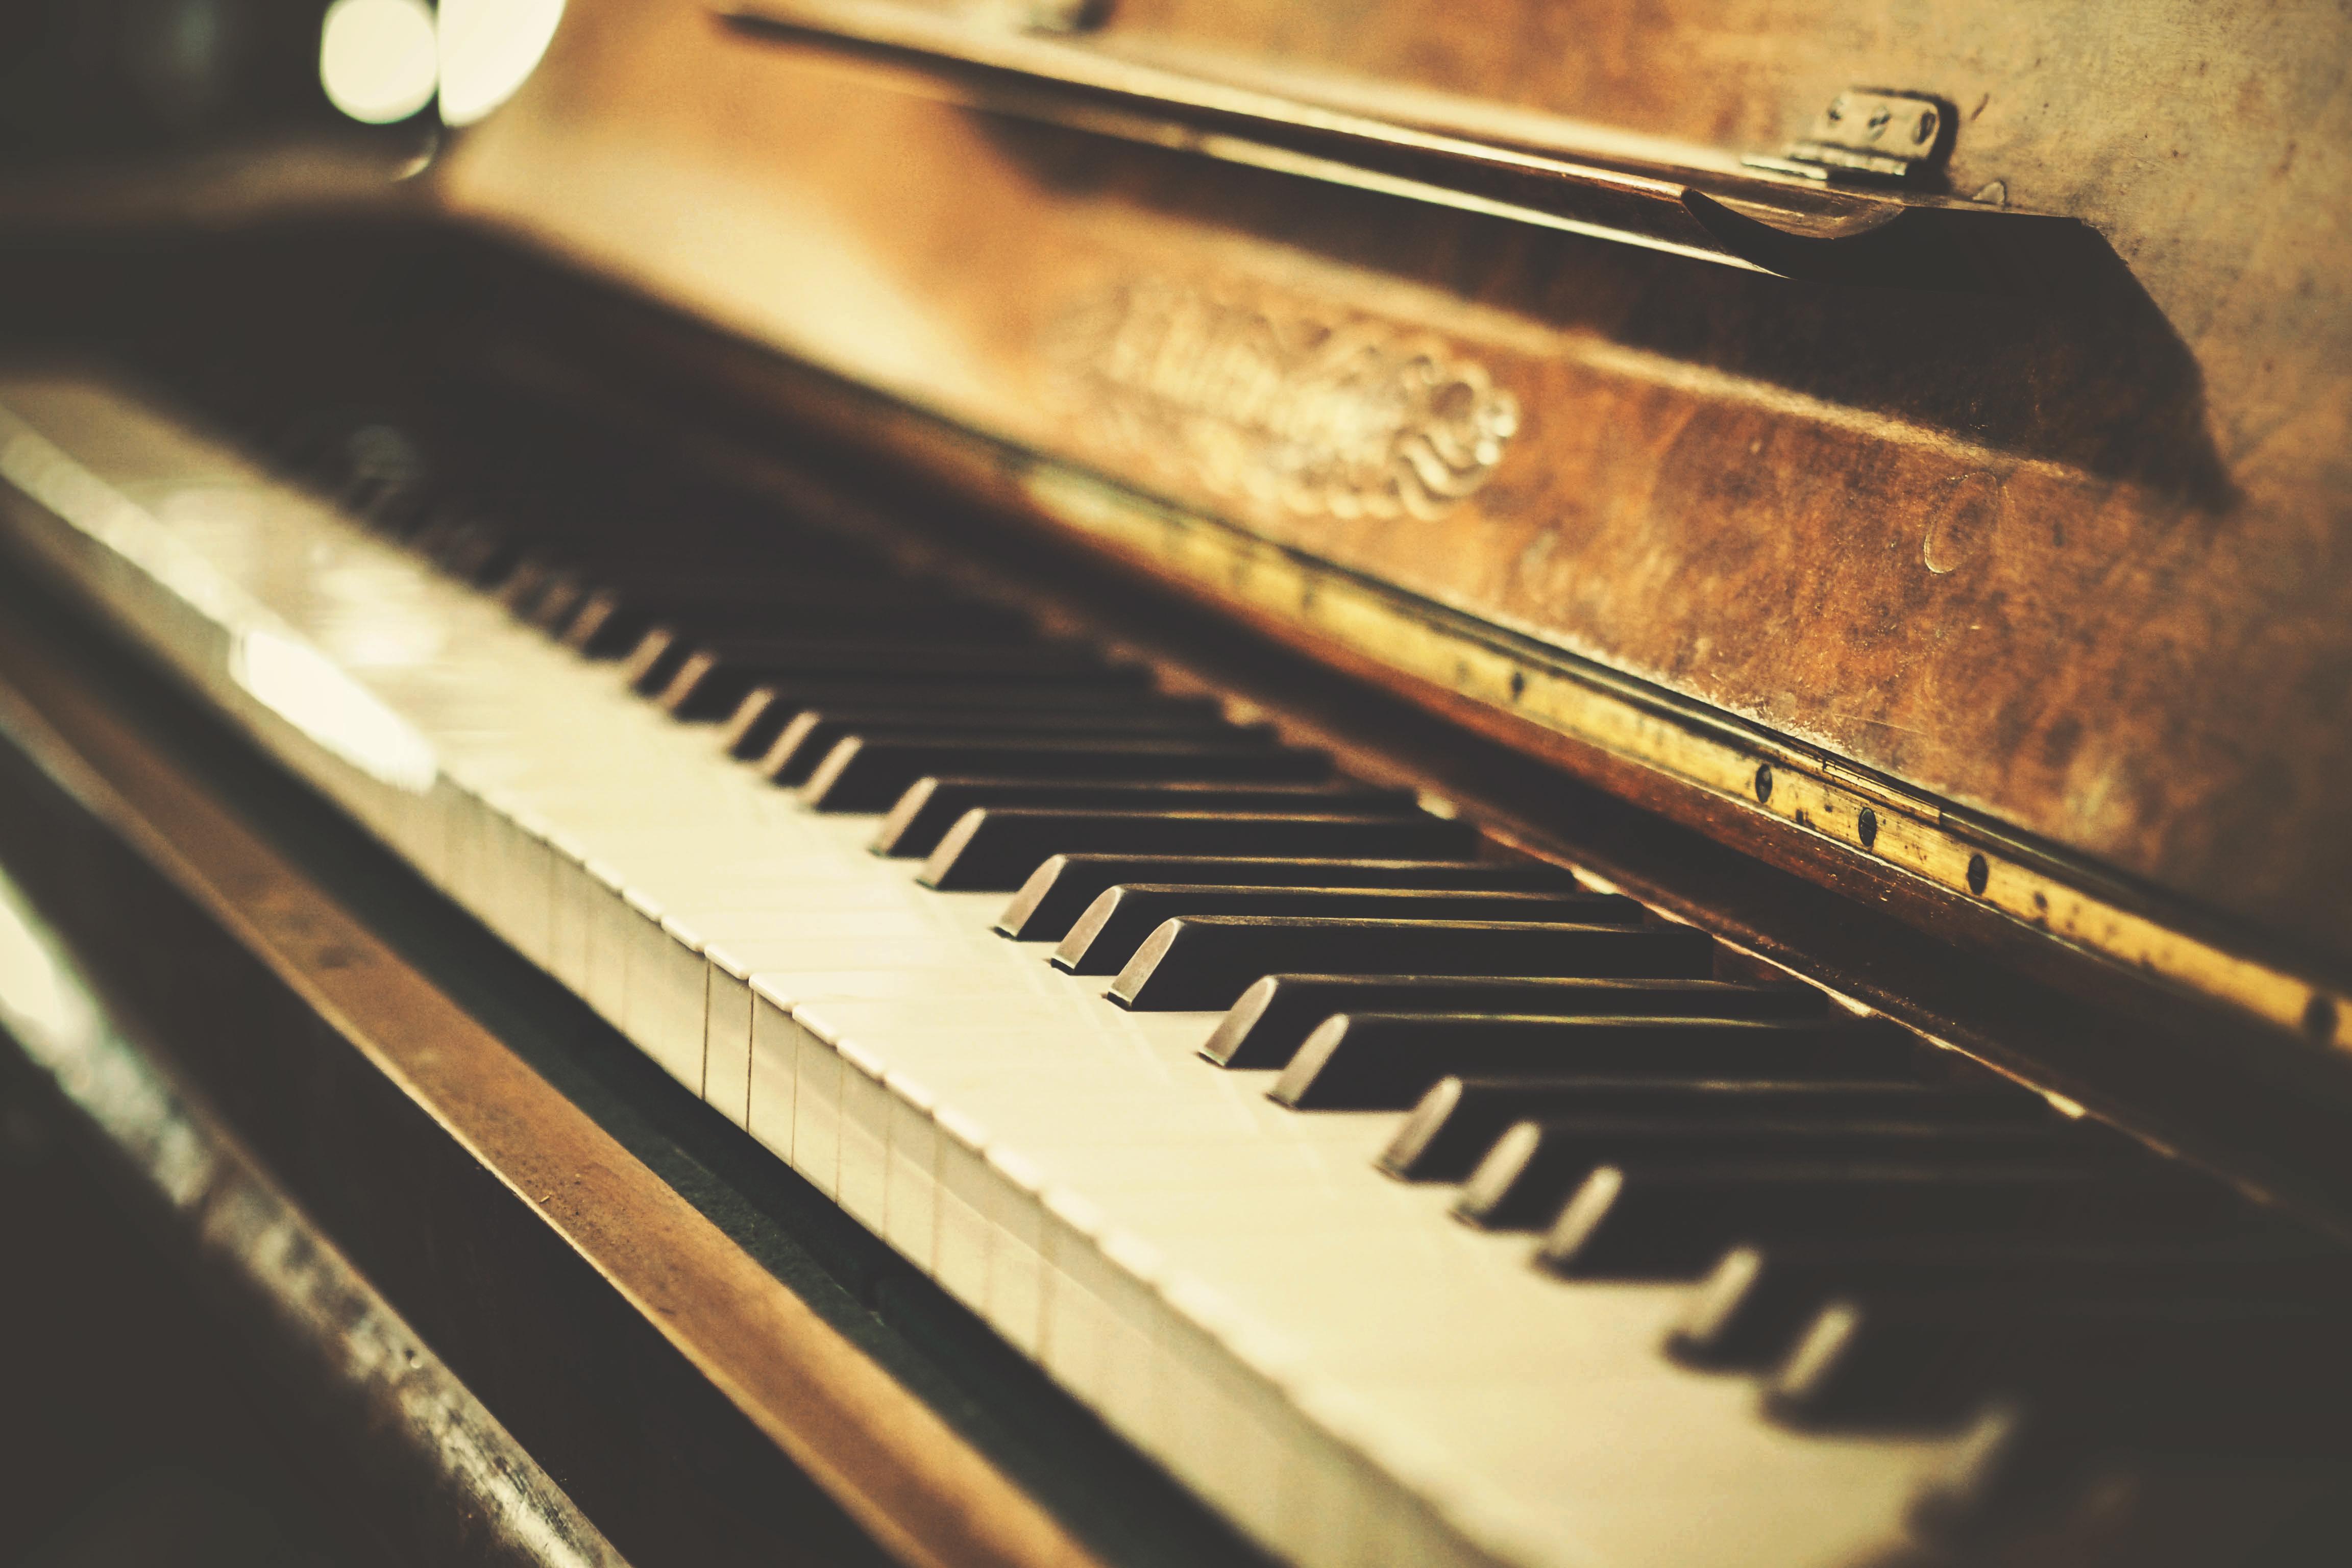 Download Wallpaper Retro Photo Old Vintage Piano Old